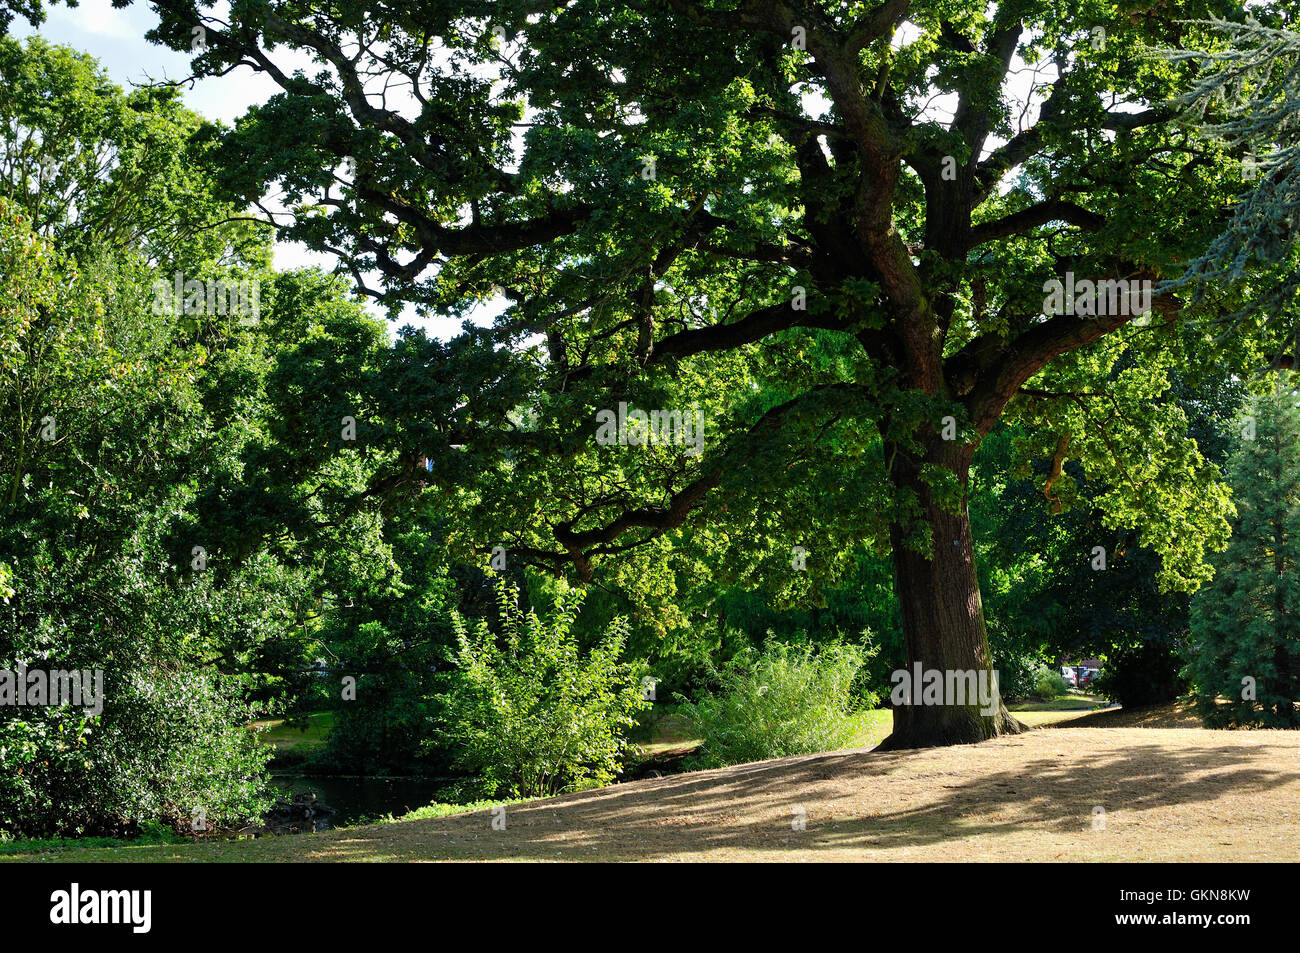 Springfield Park, Hackney, London, in summertime - Stock Image